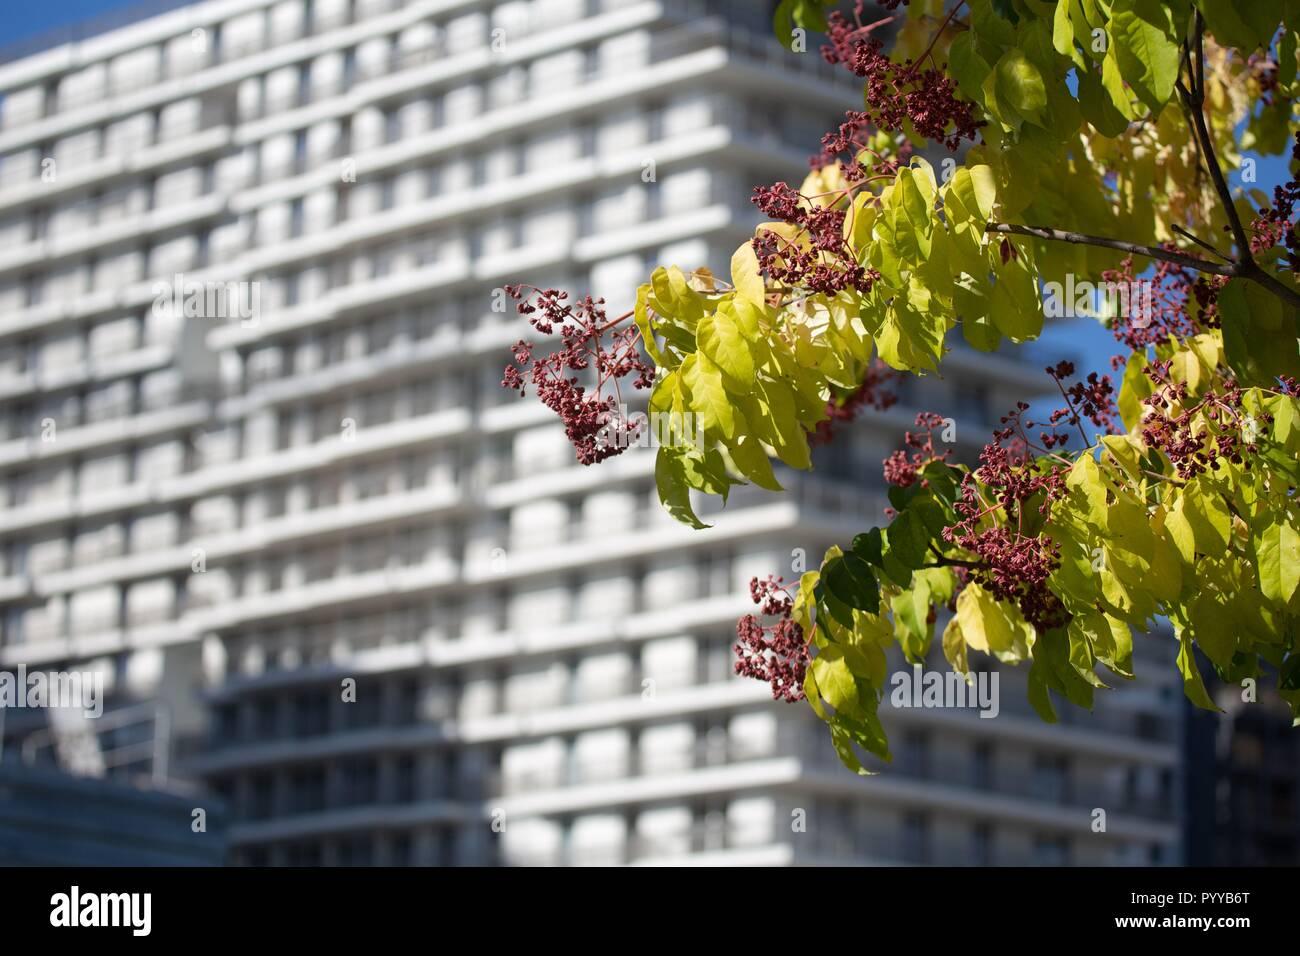 France, Ile de France, Paris 17th arrondissement, Paris, the new Batignolles neighborhood, around the Martin Luther King park, site construction, buildings, new neighborhood Stock Photo